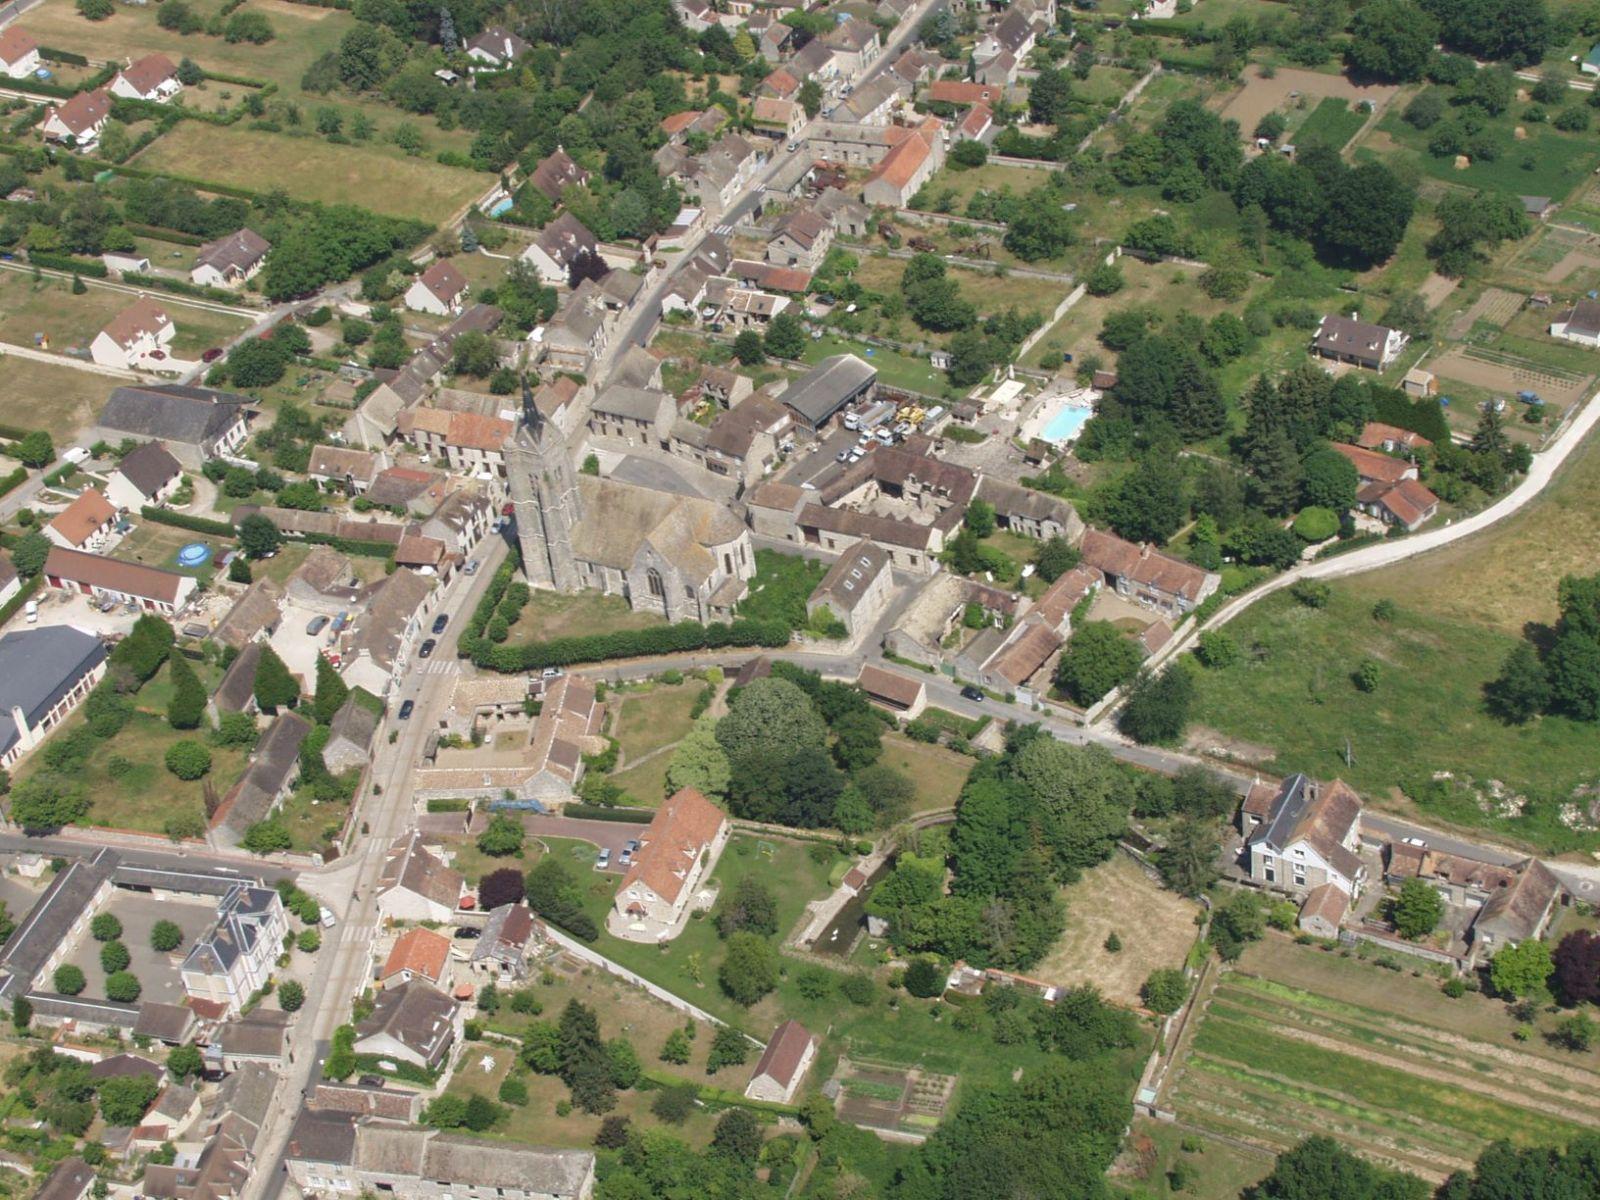 Vue-aerienne-Moigny